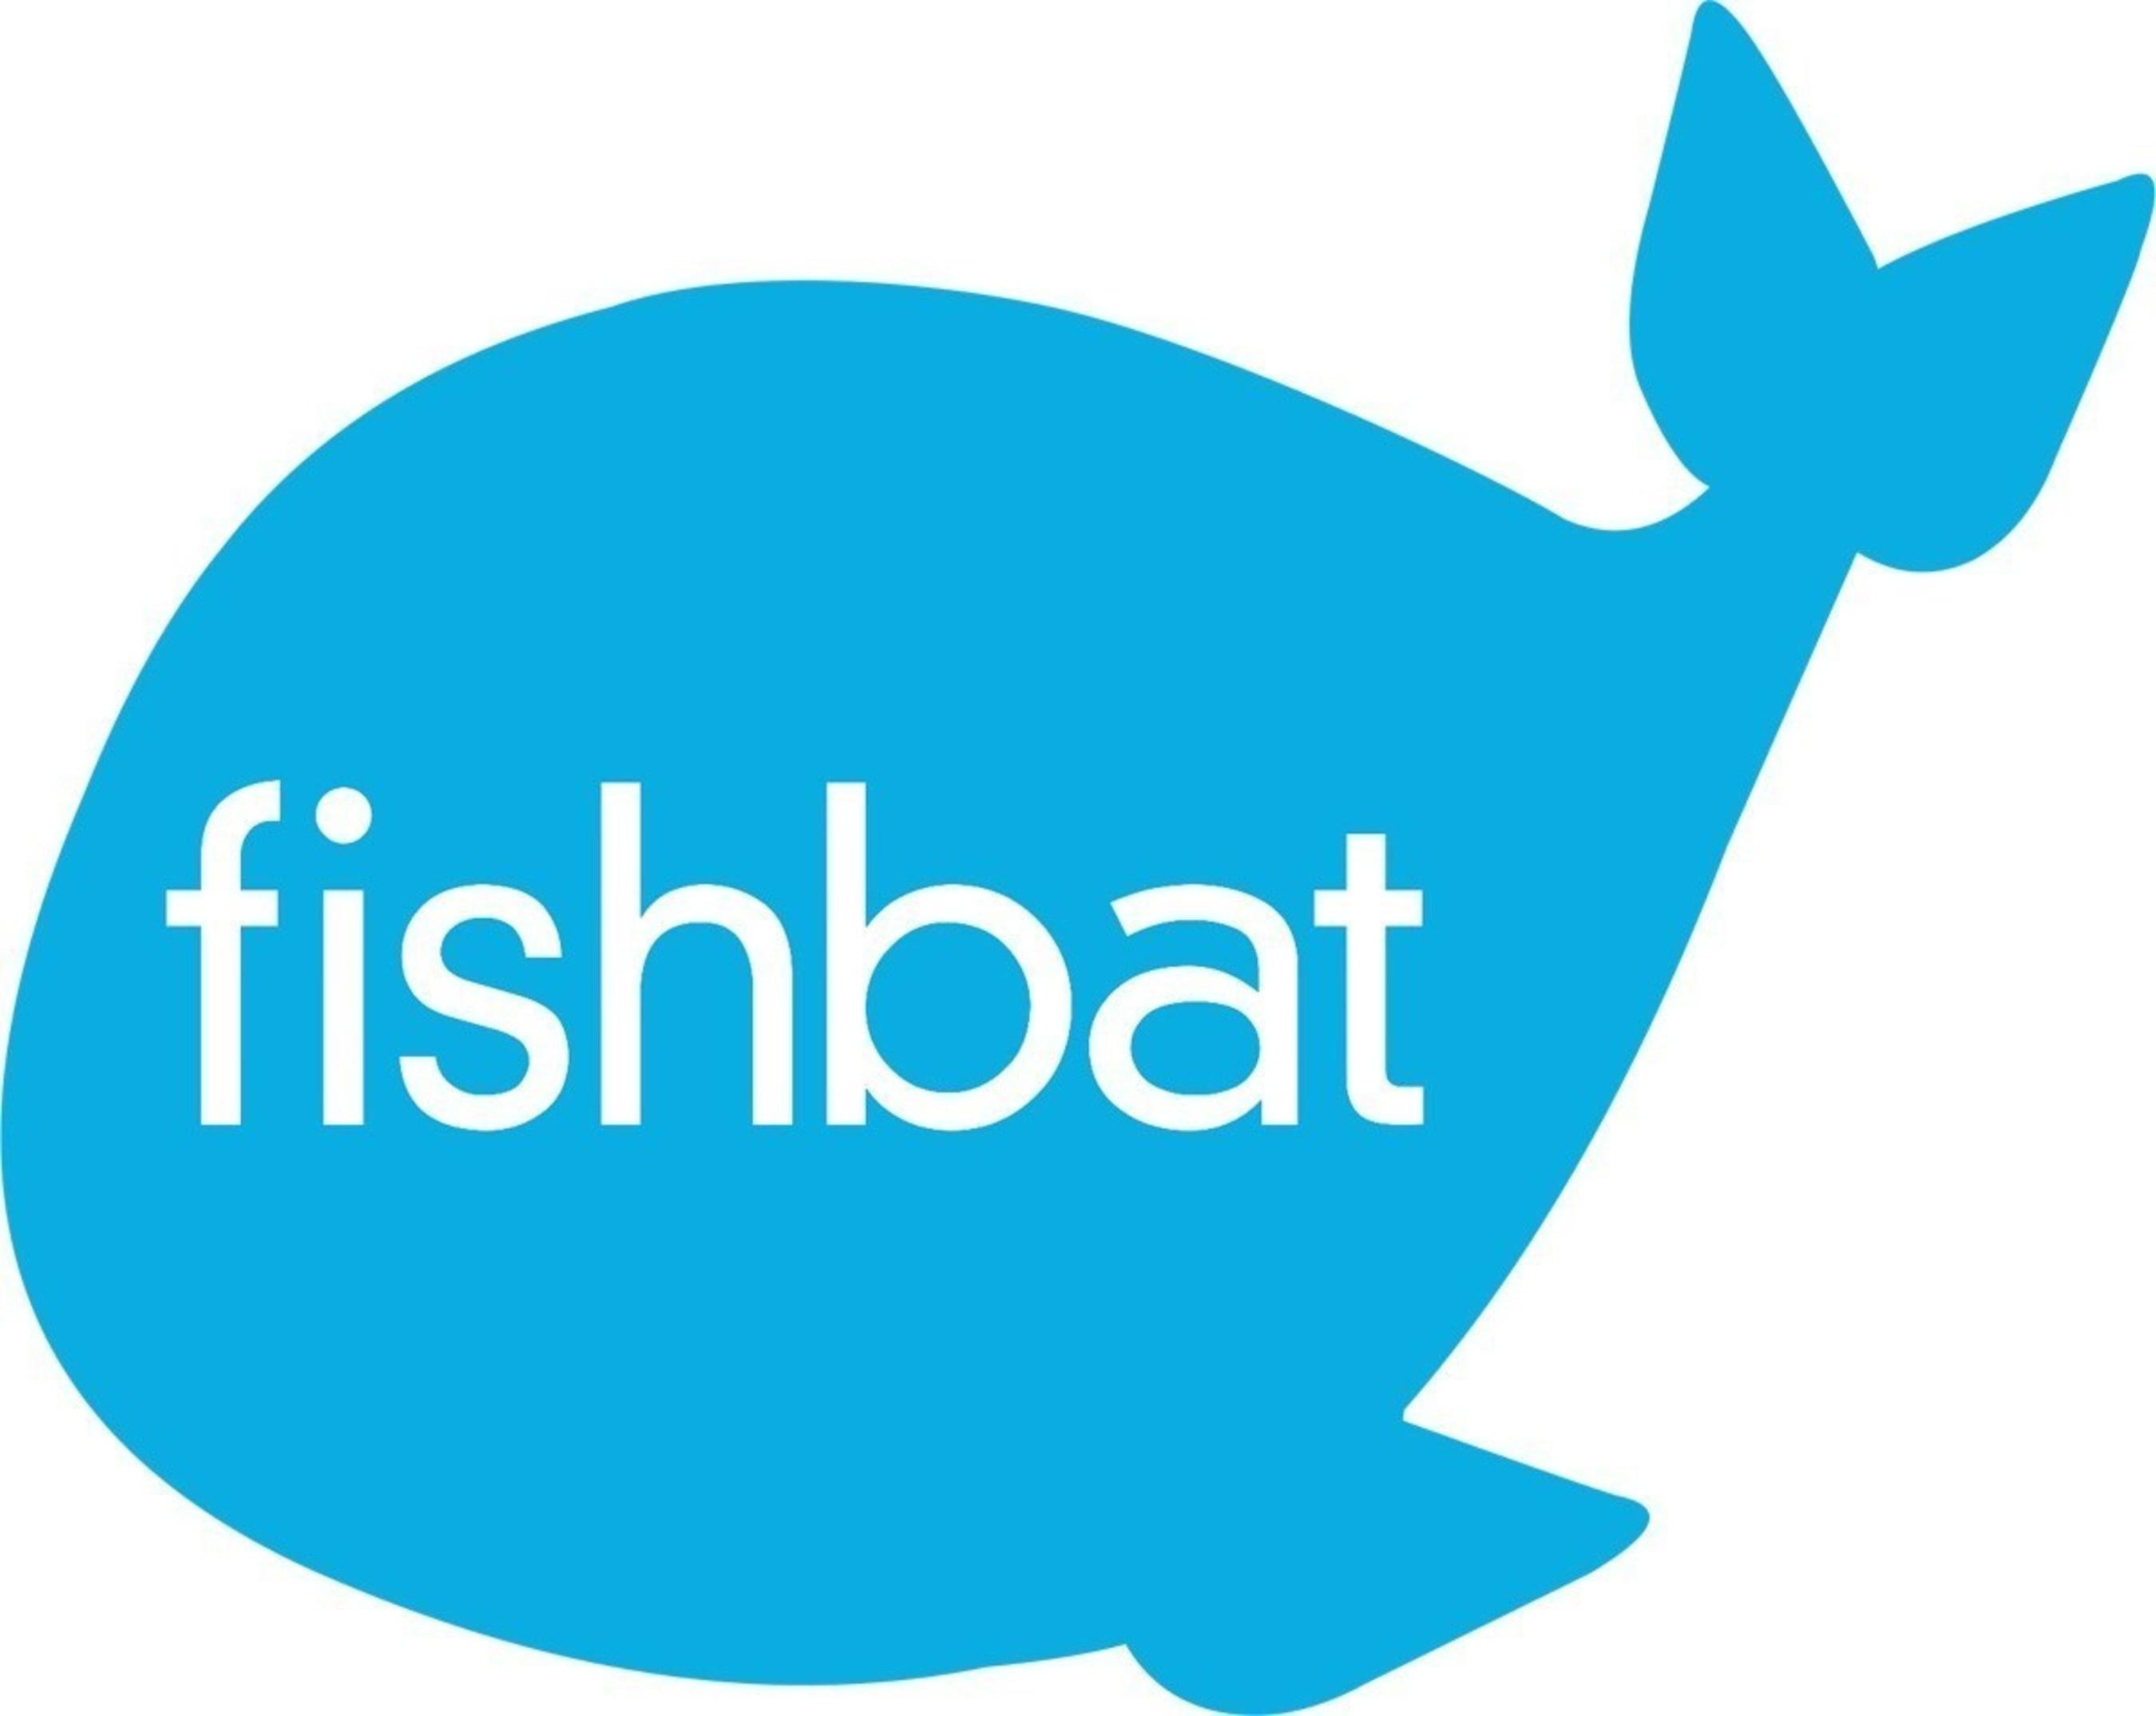 fishbat COO Scott Darrohn Discusses 3 Tips for Creating Killer Content without Sacrificing SEO